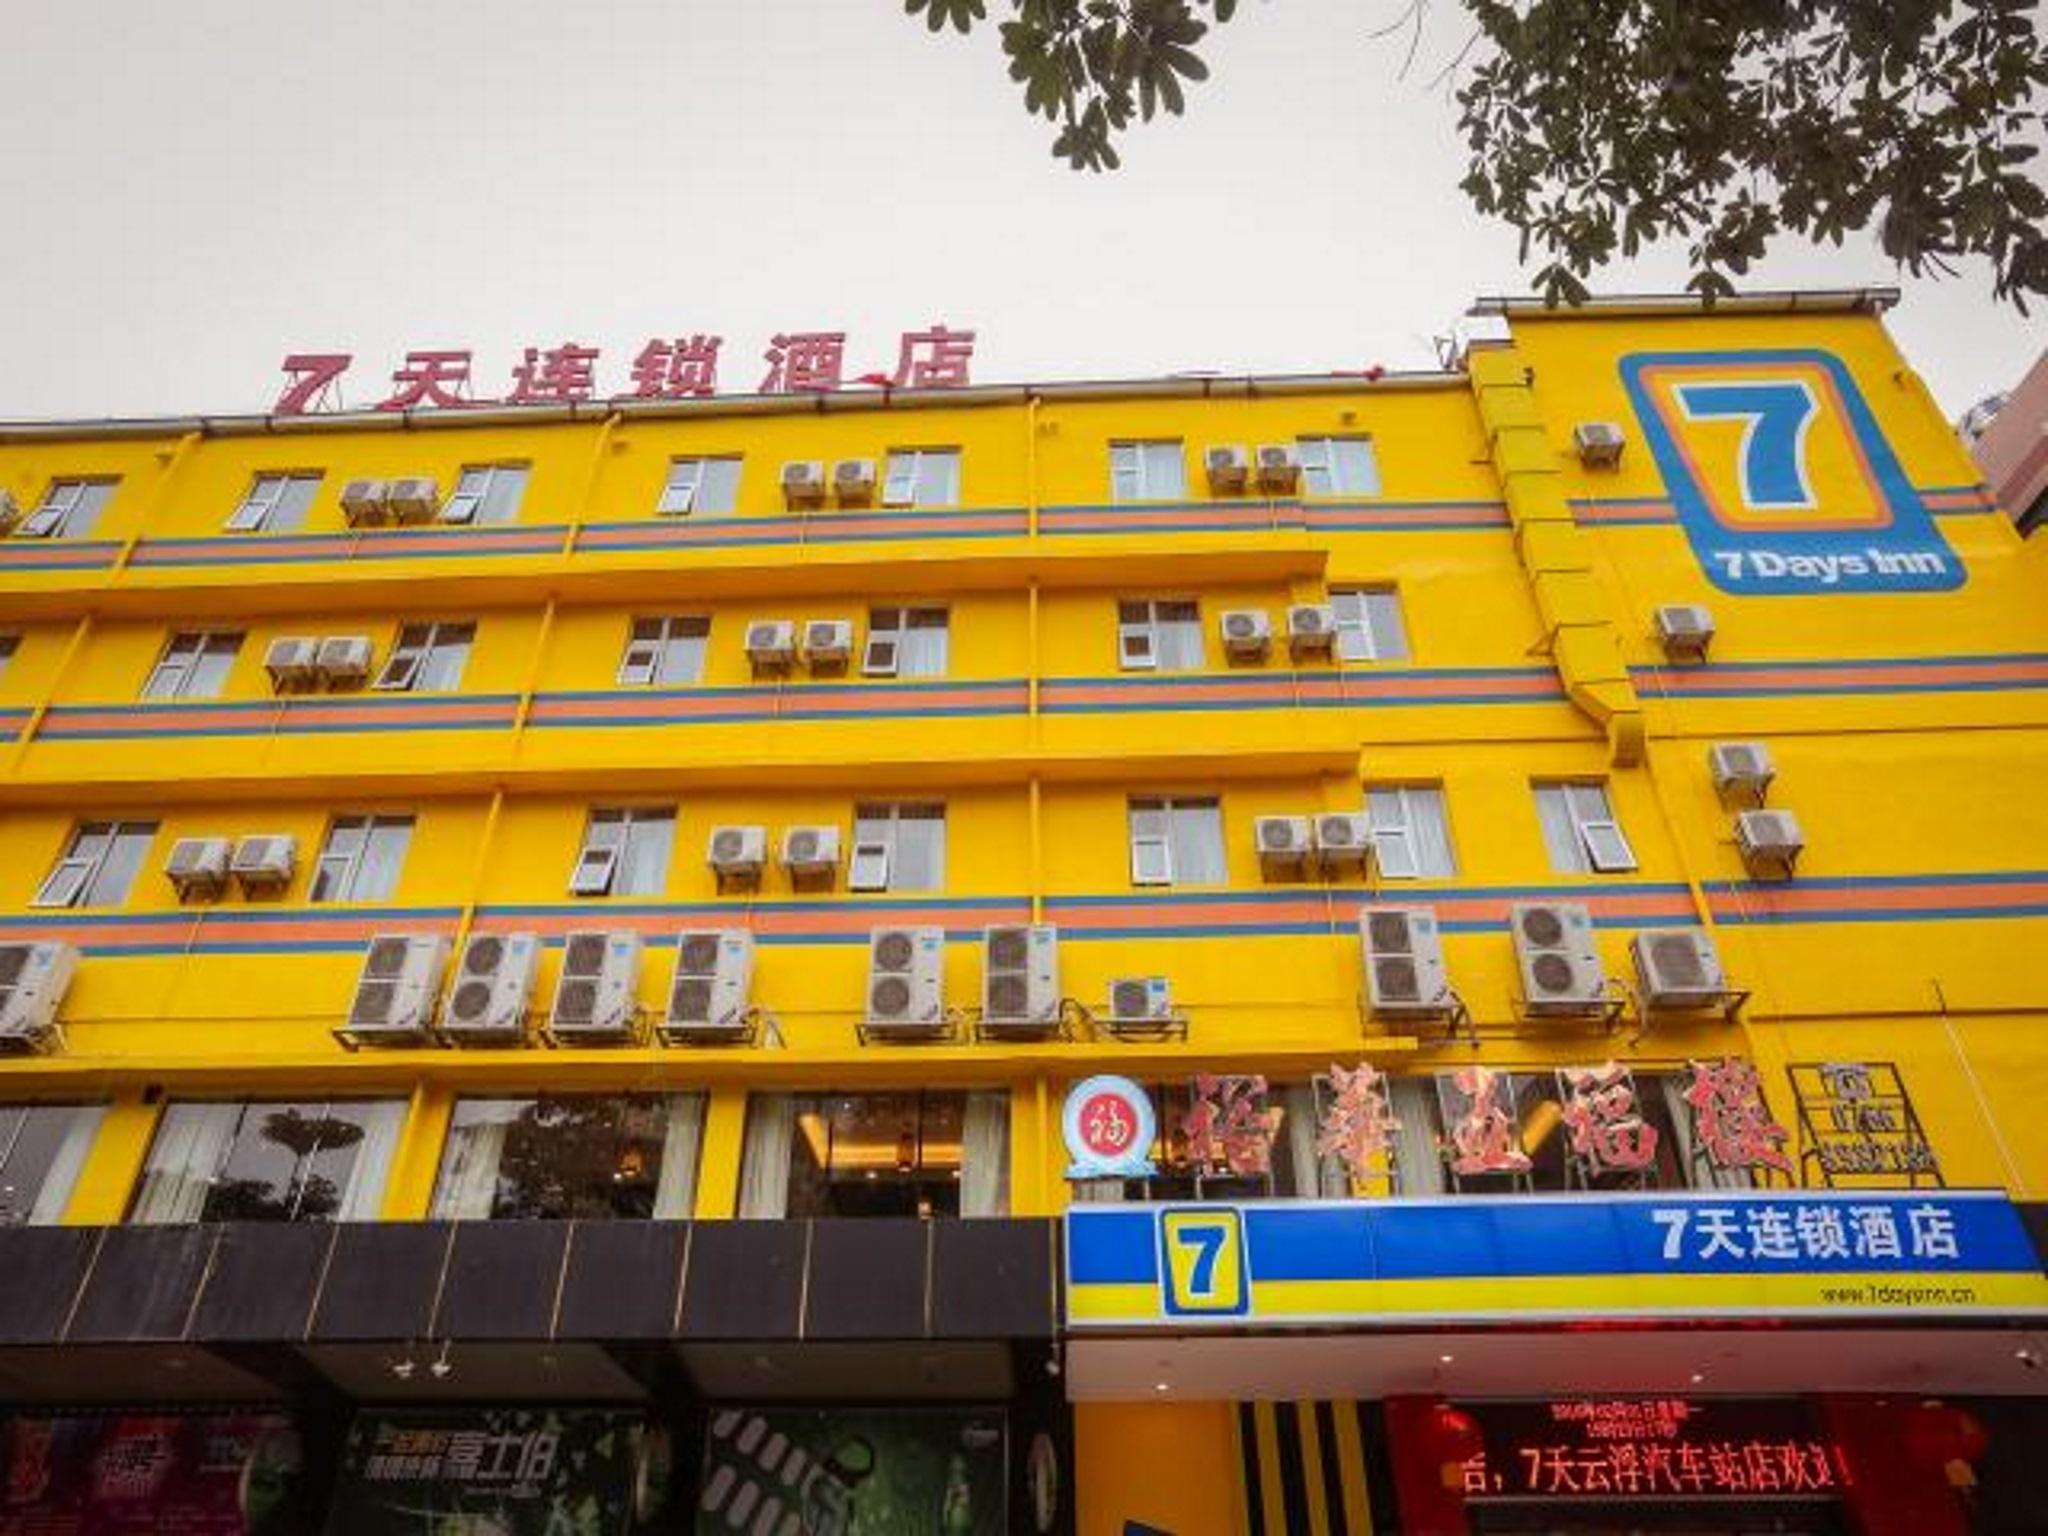 7 Days Inn Yunfu Coach Terminal Branch